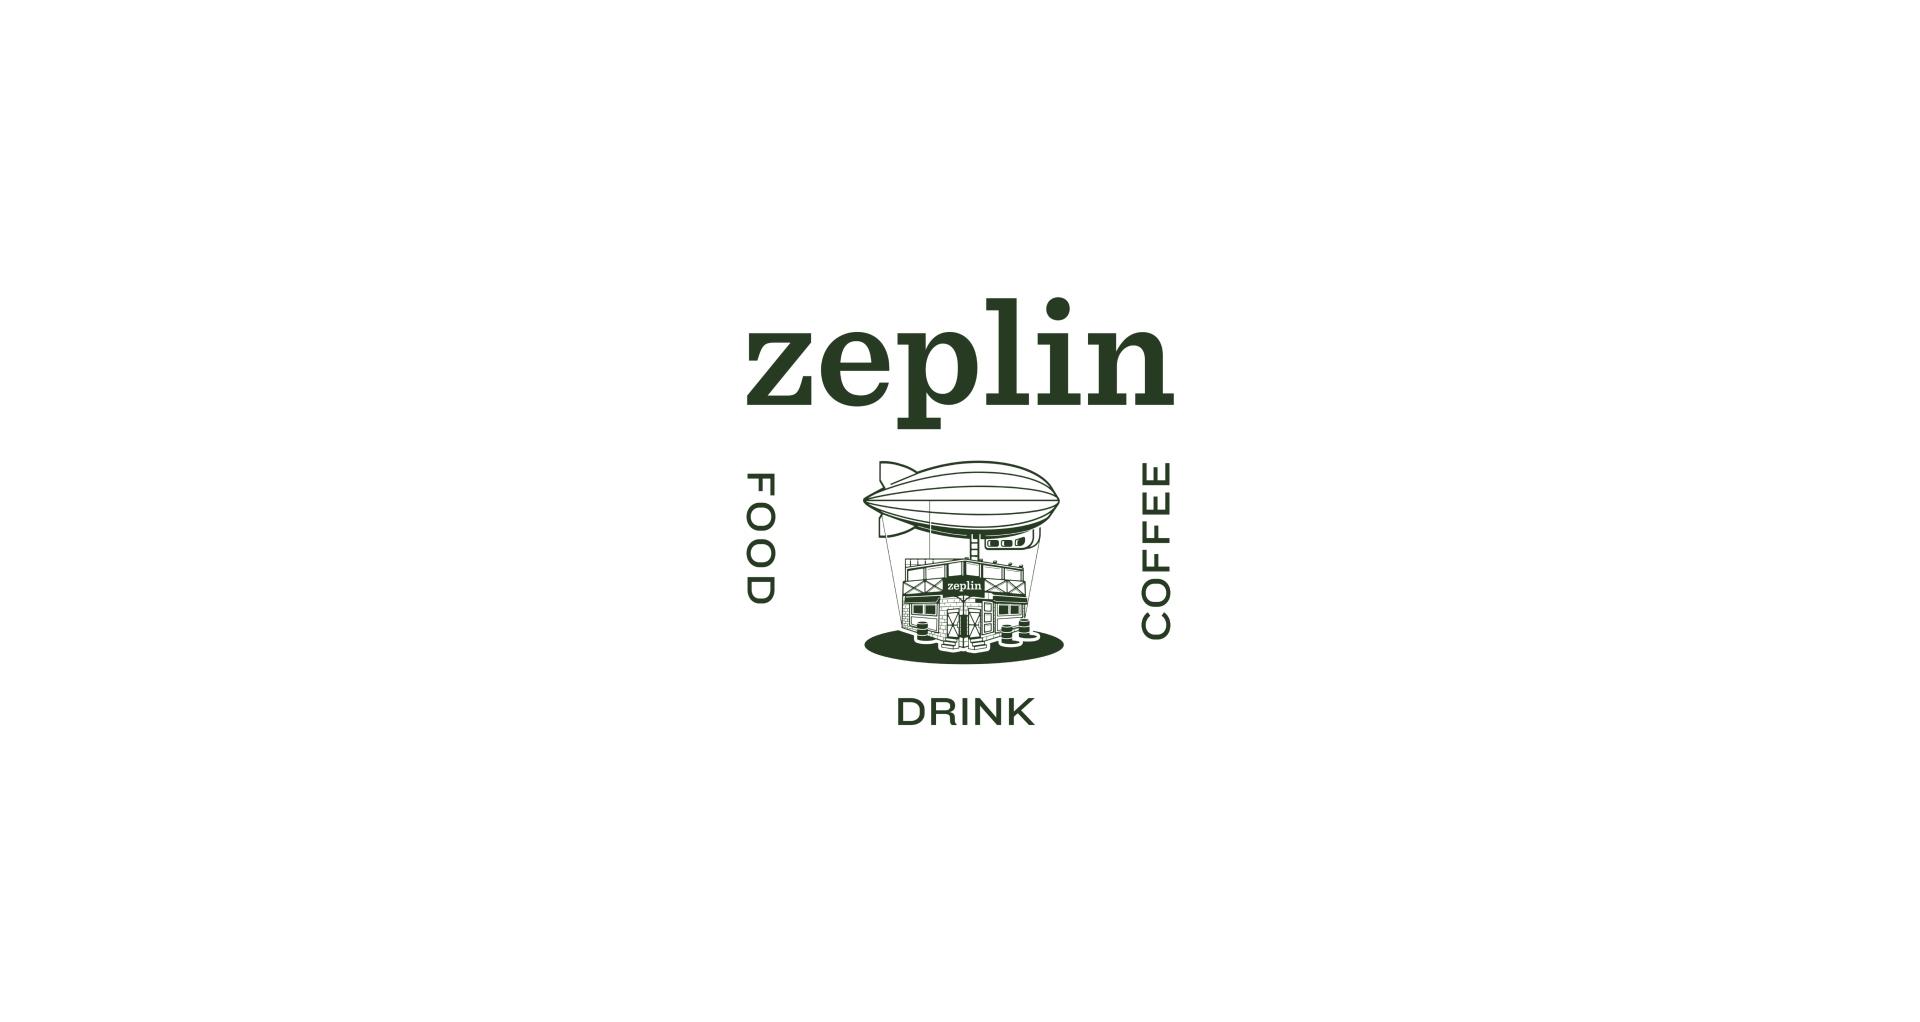 zeki-michael-logo-design-graphic-branding-identity-freelance-studio-design-zeplin